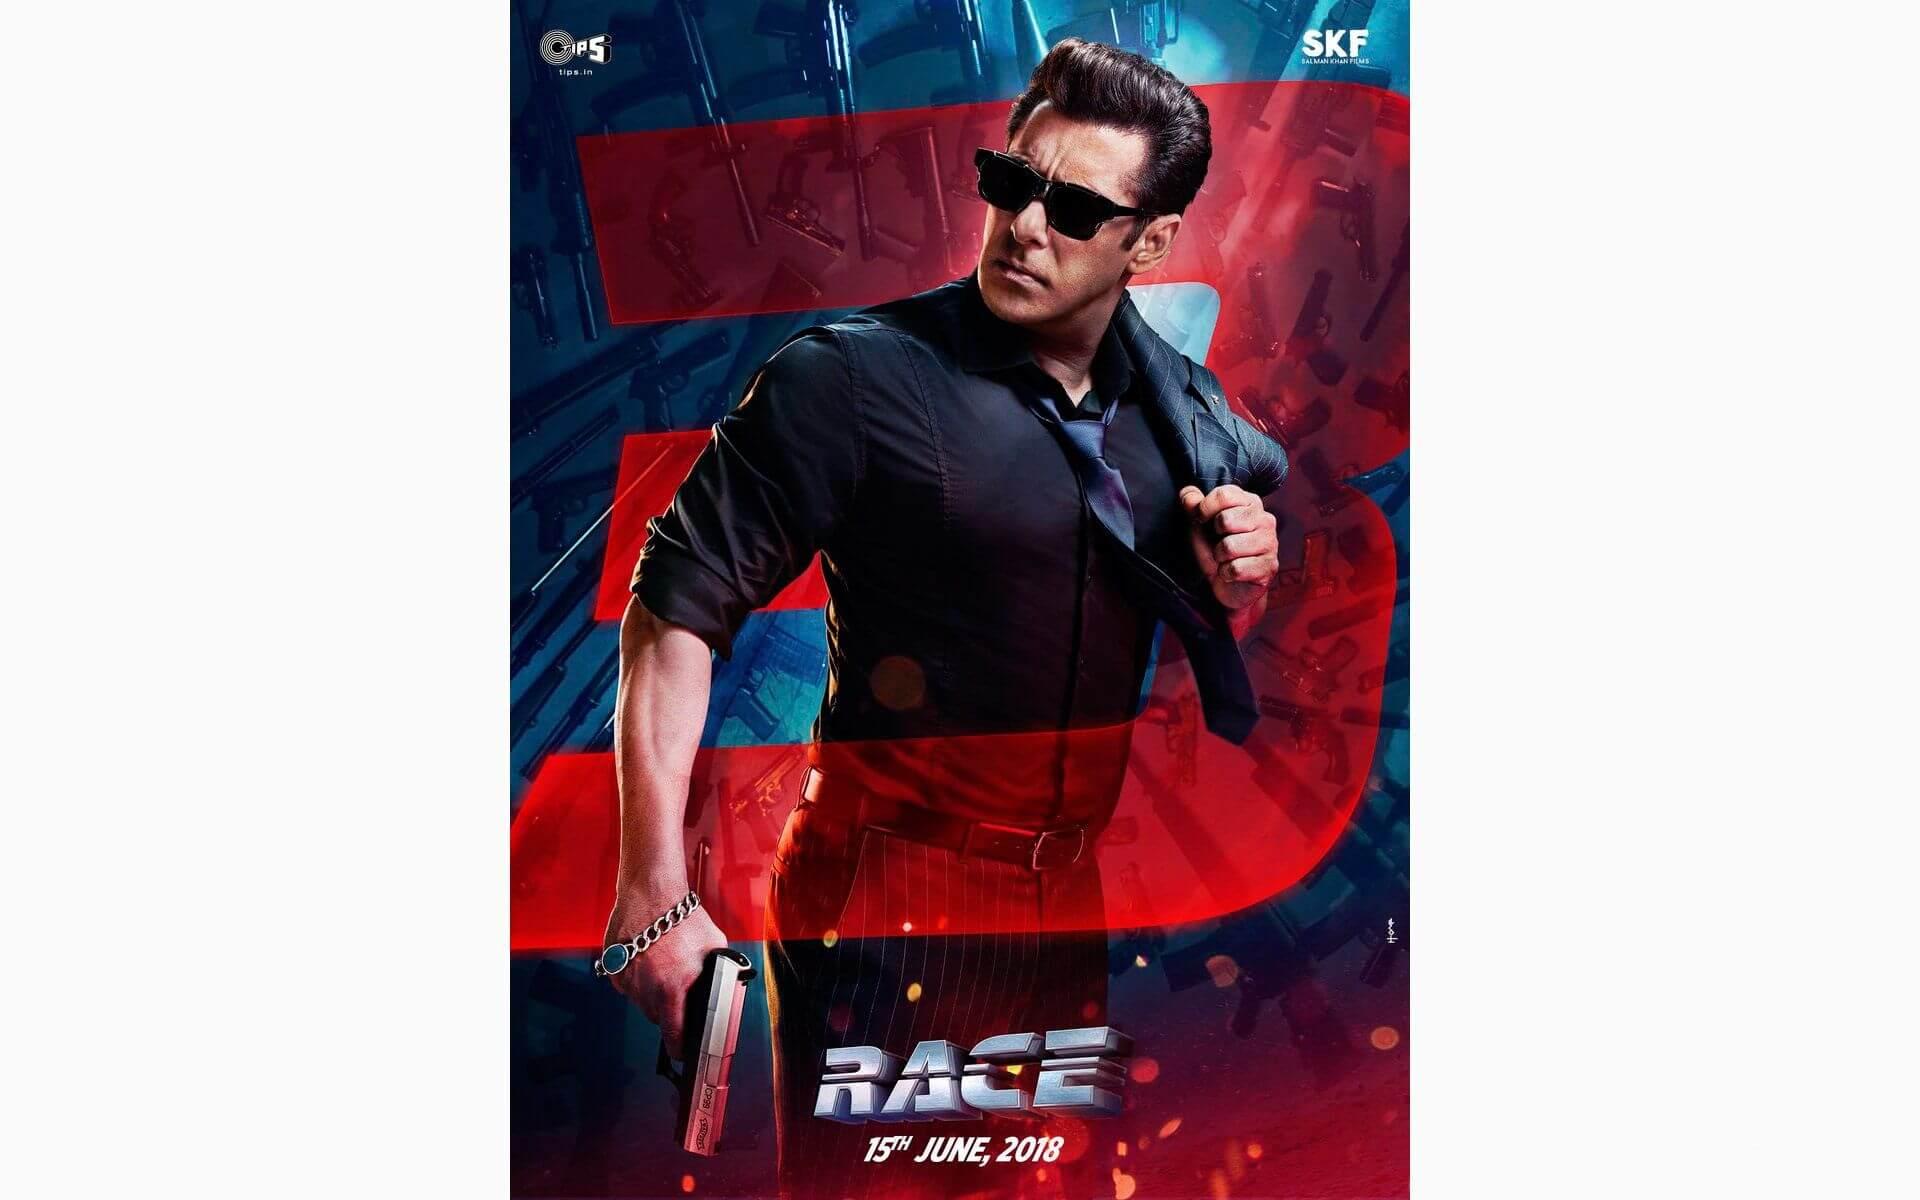 Salman Khan Photo, Age, News, Birthday, Height, Sister, Biography, Girlfriend, Awards, Address, Song, Video, Net Worth, Education, Twitter, Instagram, Facebook, Wiki, Imdb, Website, Youtube (51)